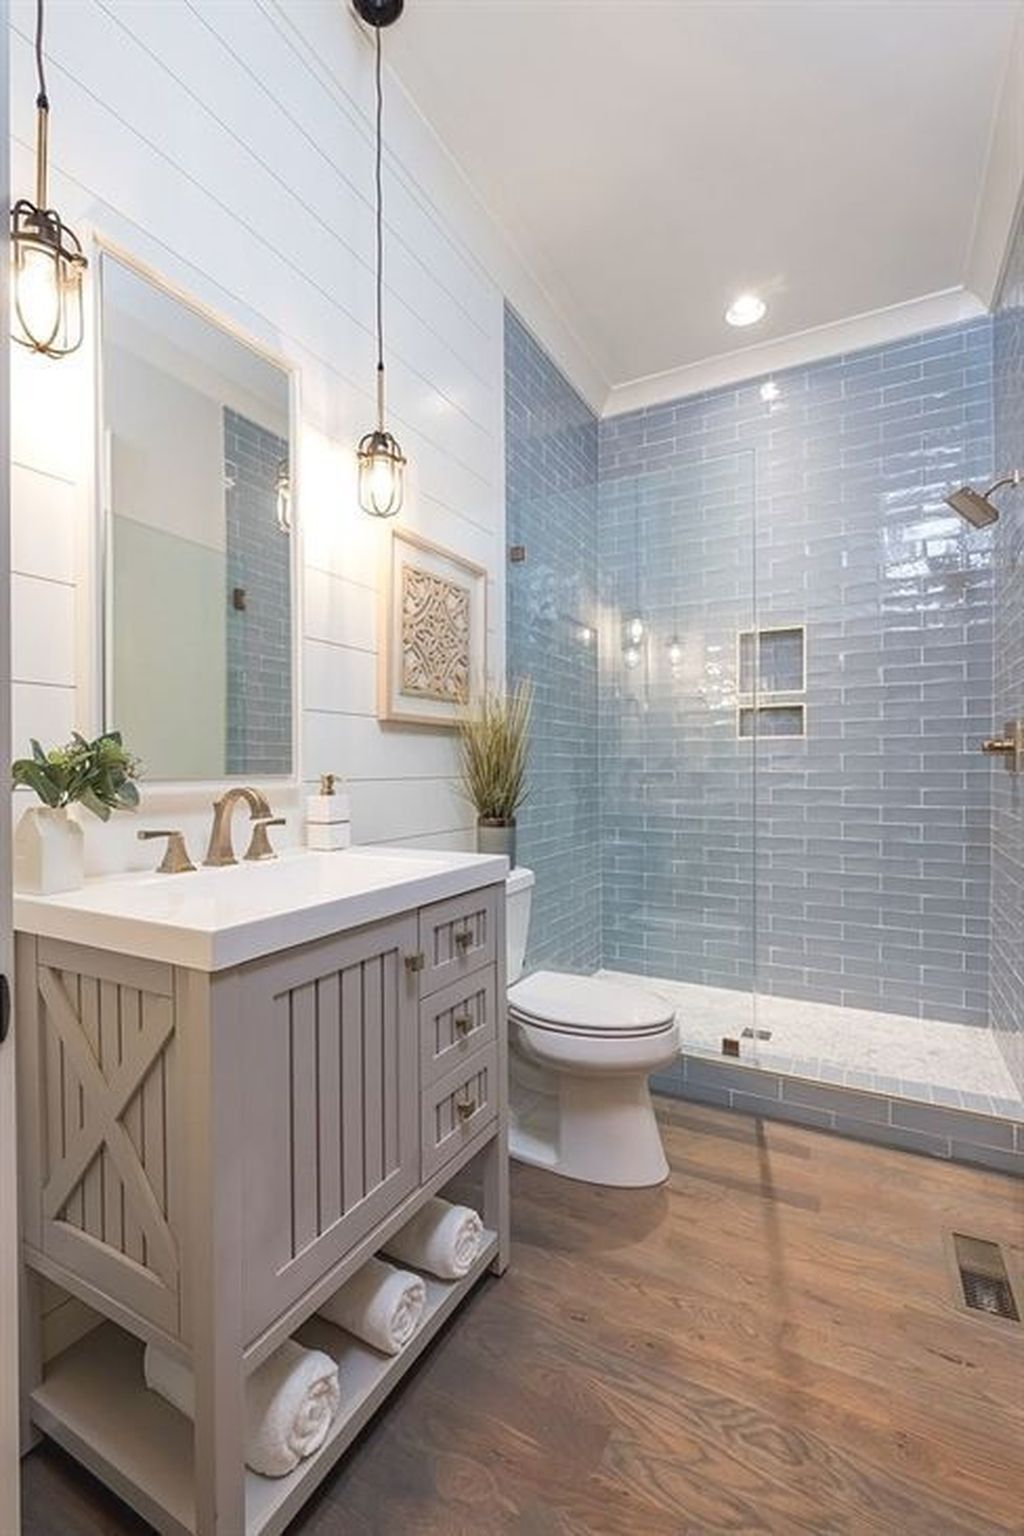 30 lovely coastal bathroom decoration ideas bathroom on bathroom renovation ideas modern id=11153